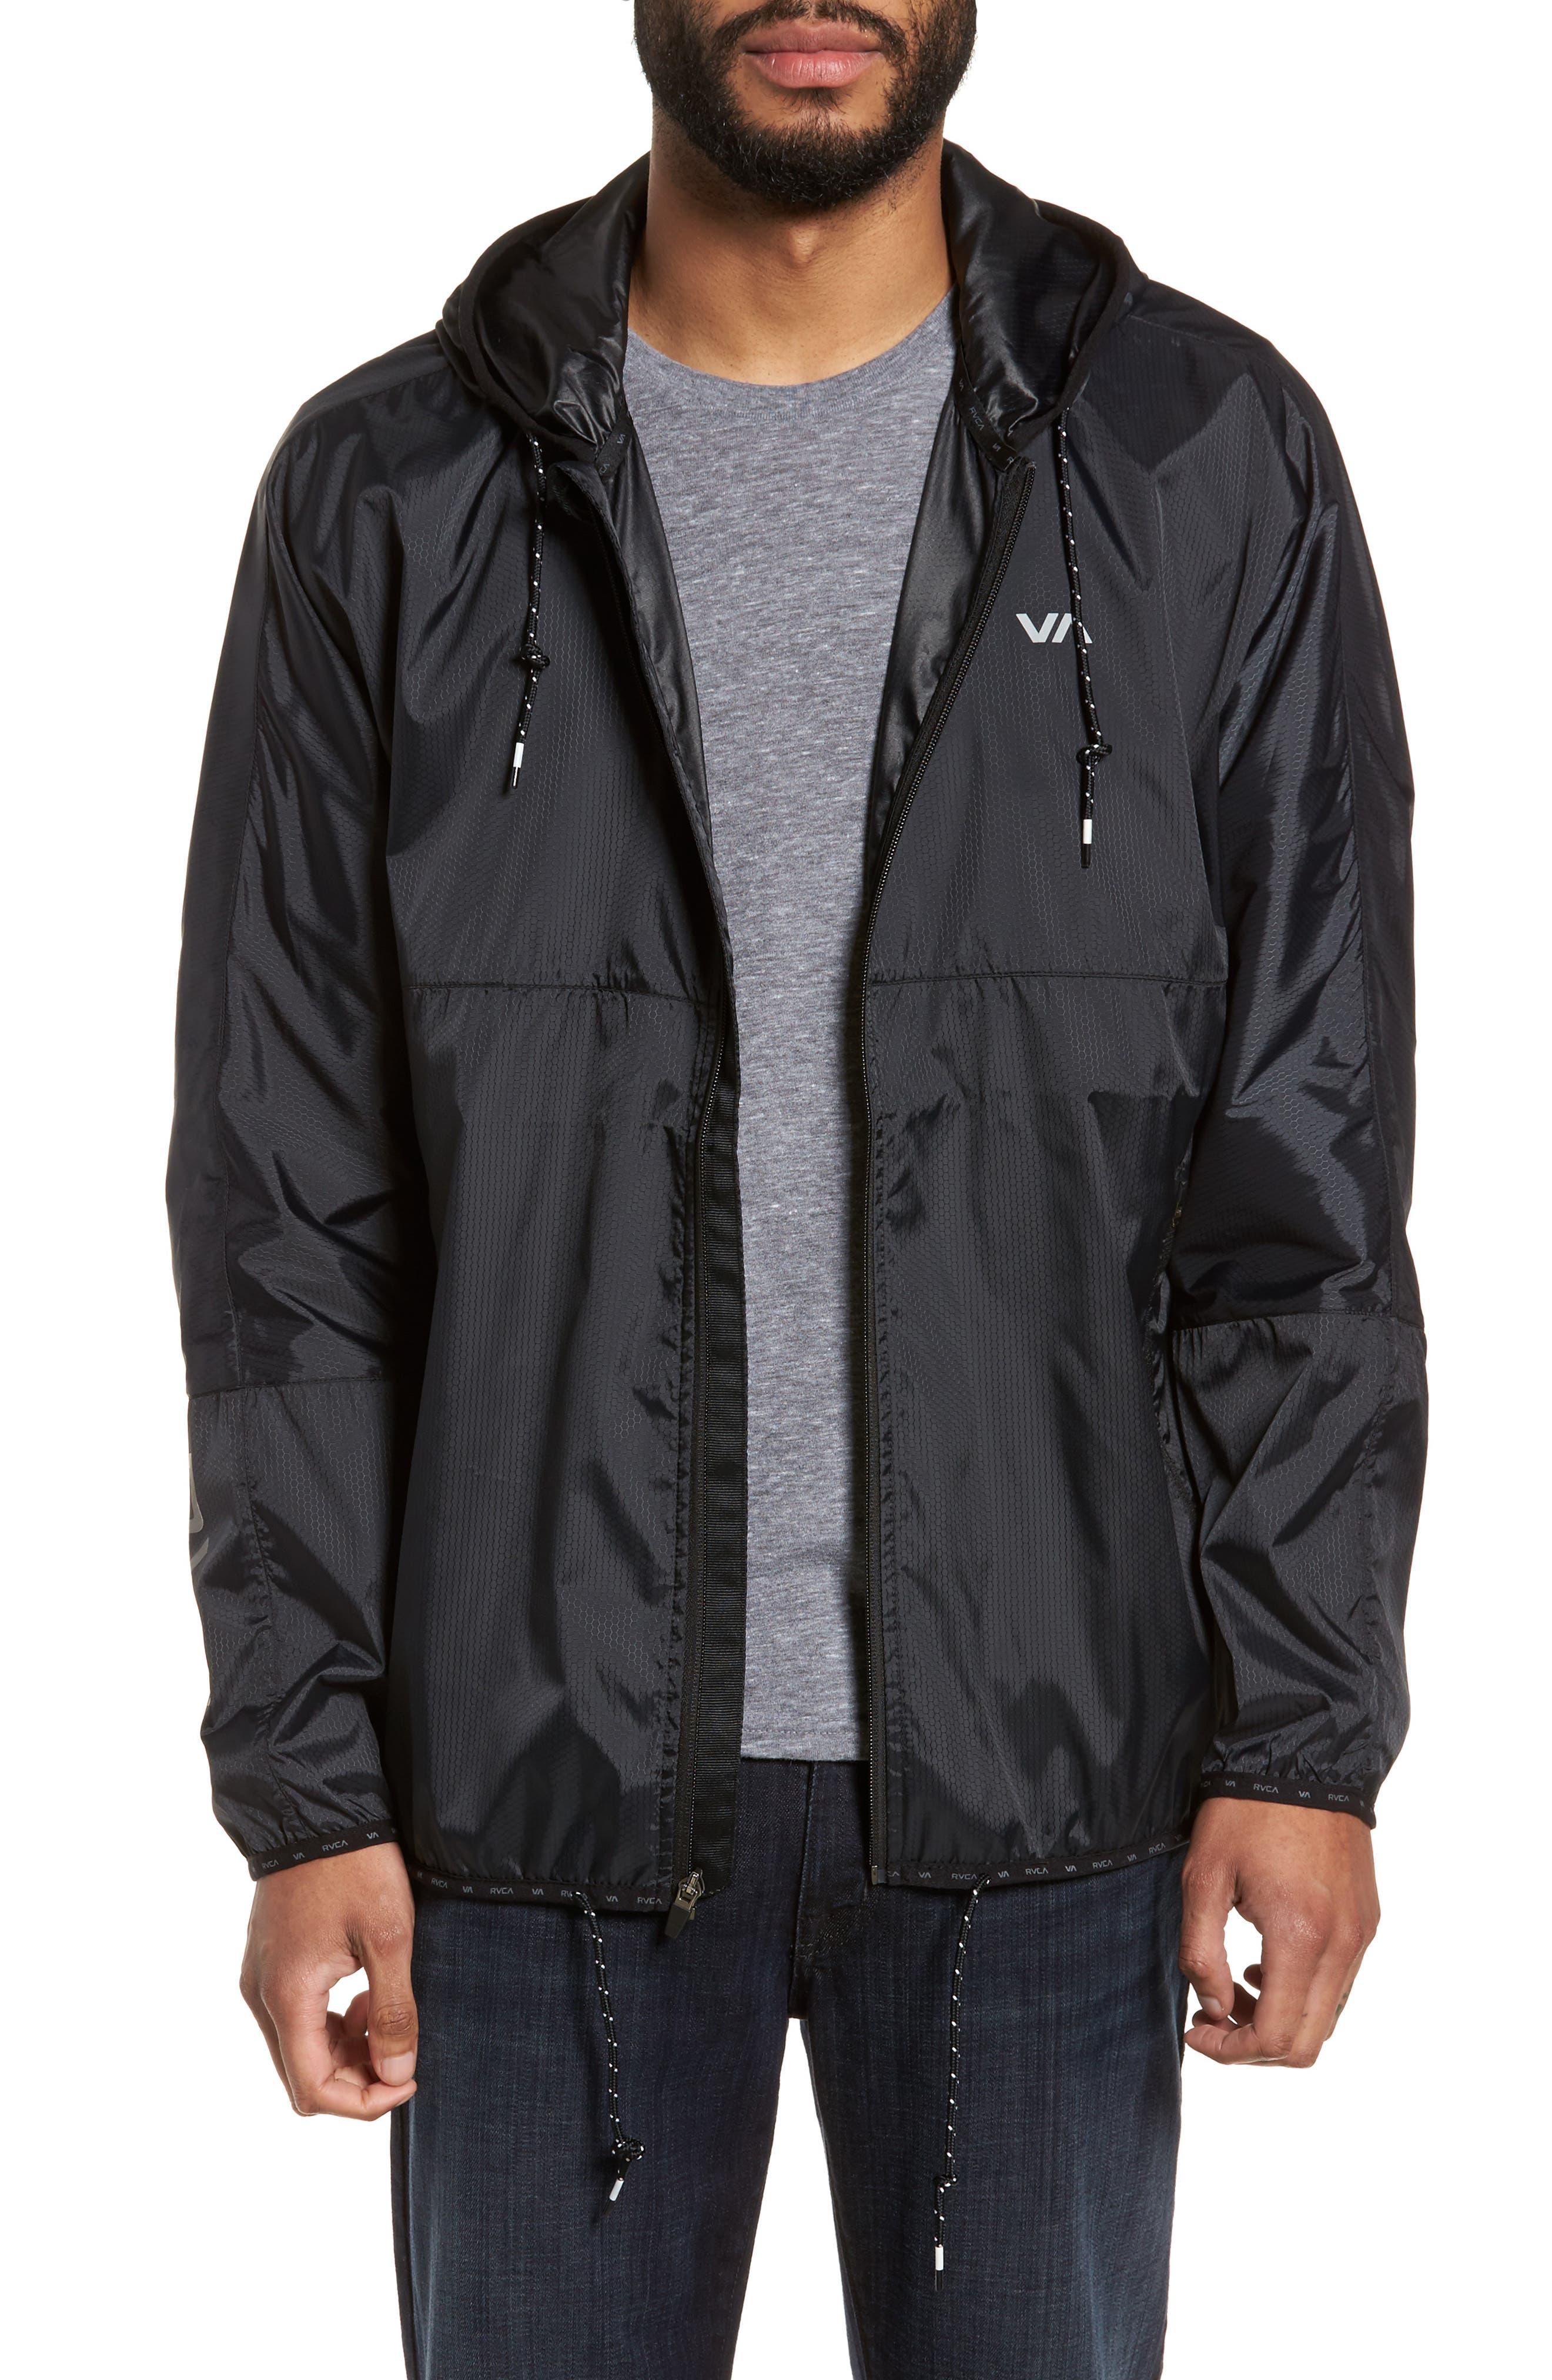 Rvca parka coat with hood